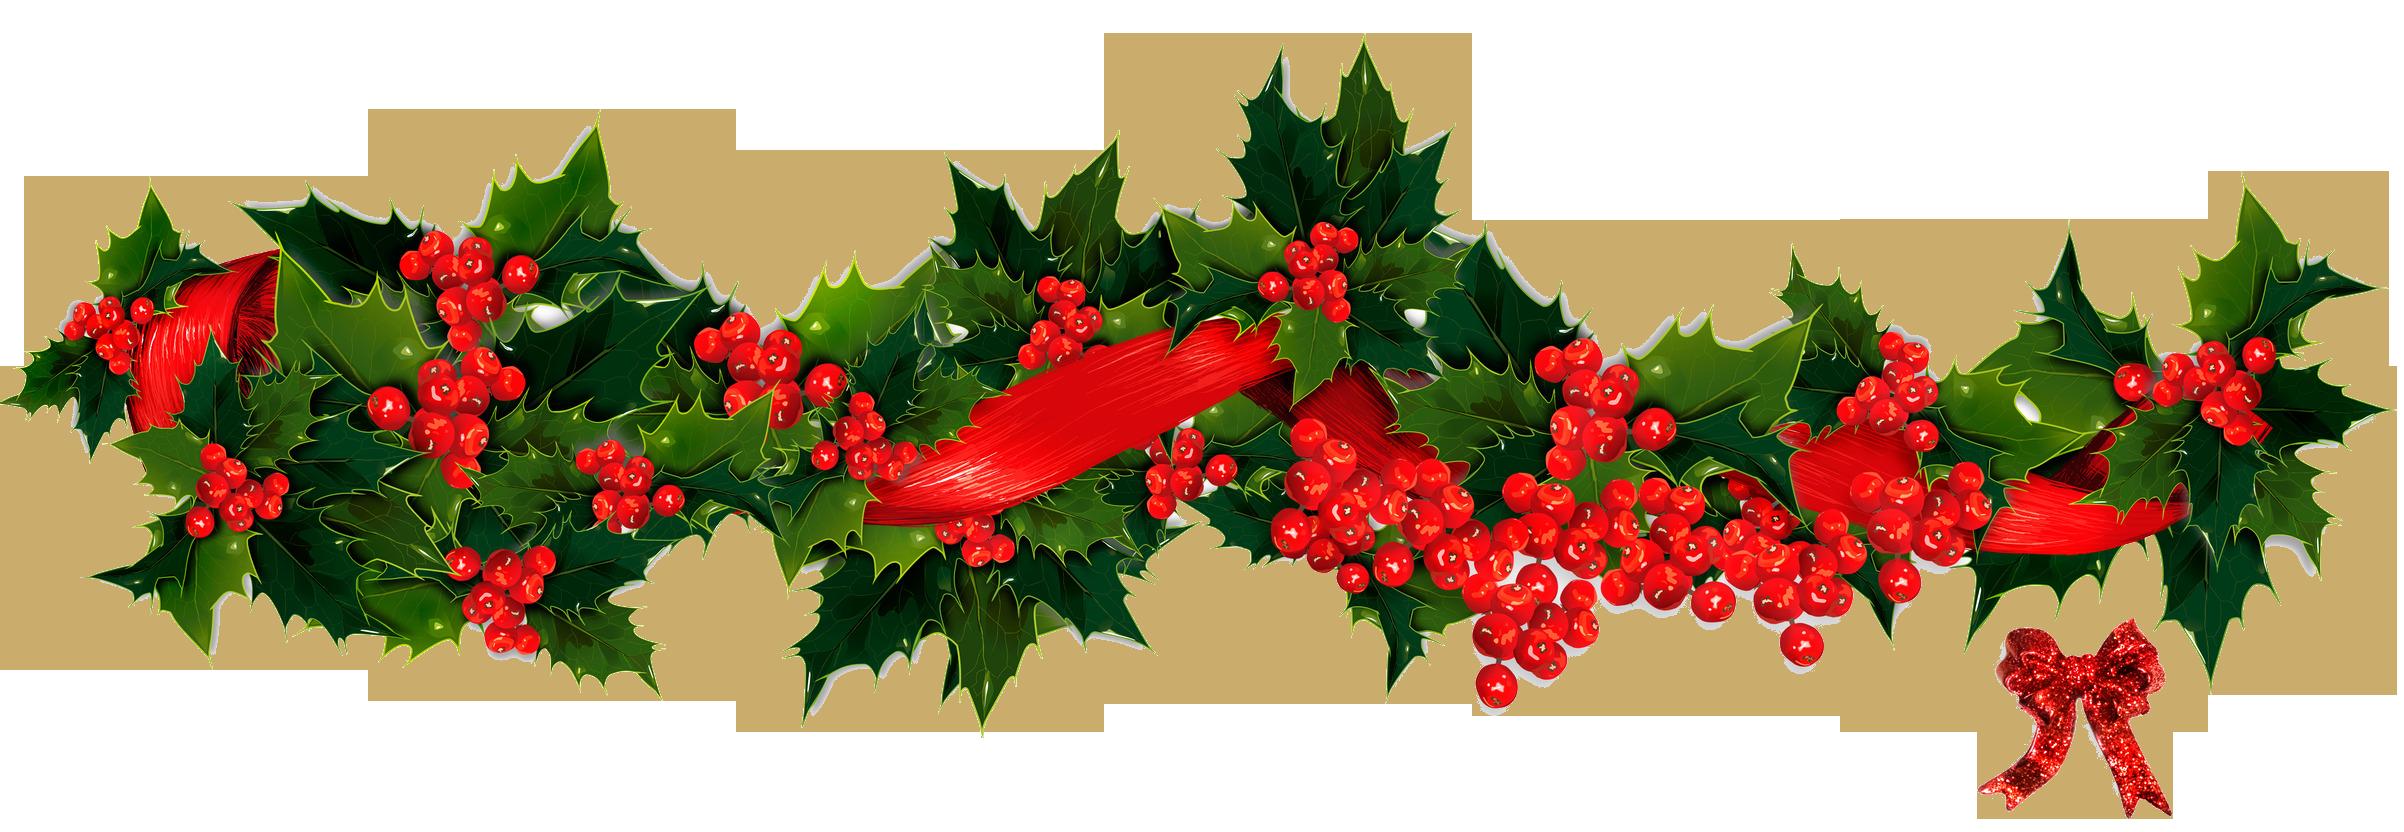 Holley clipart garland Clipart Garland Christmas transparent clipart